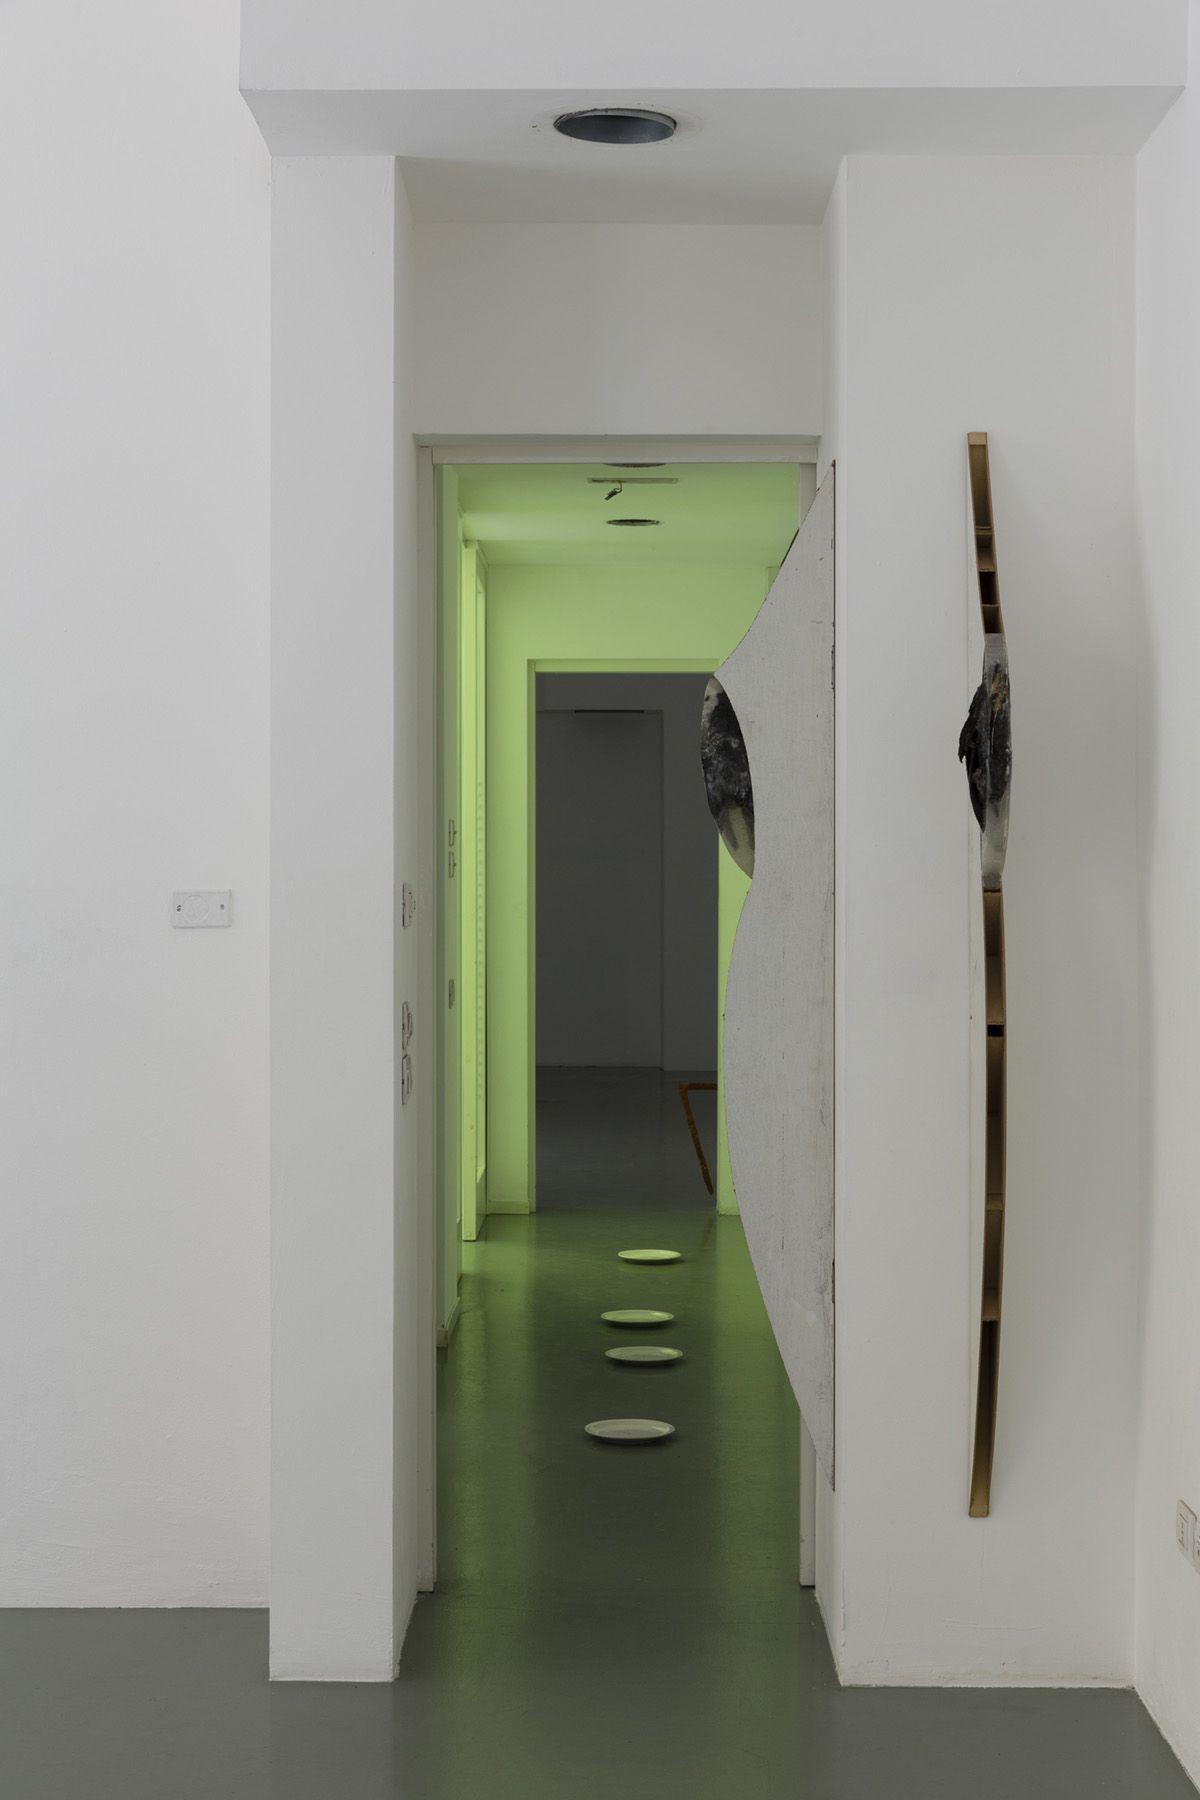 Zero Gallery, MilanoMay 12 - July 22, 2016